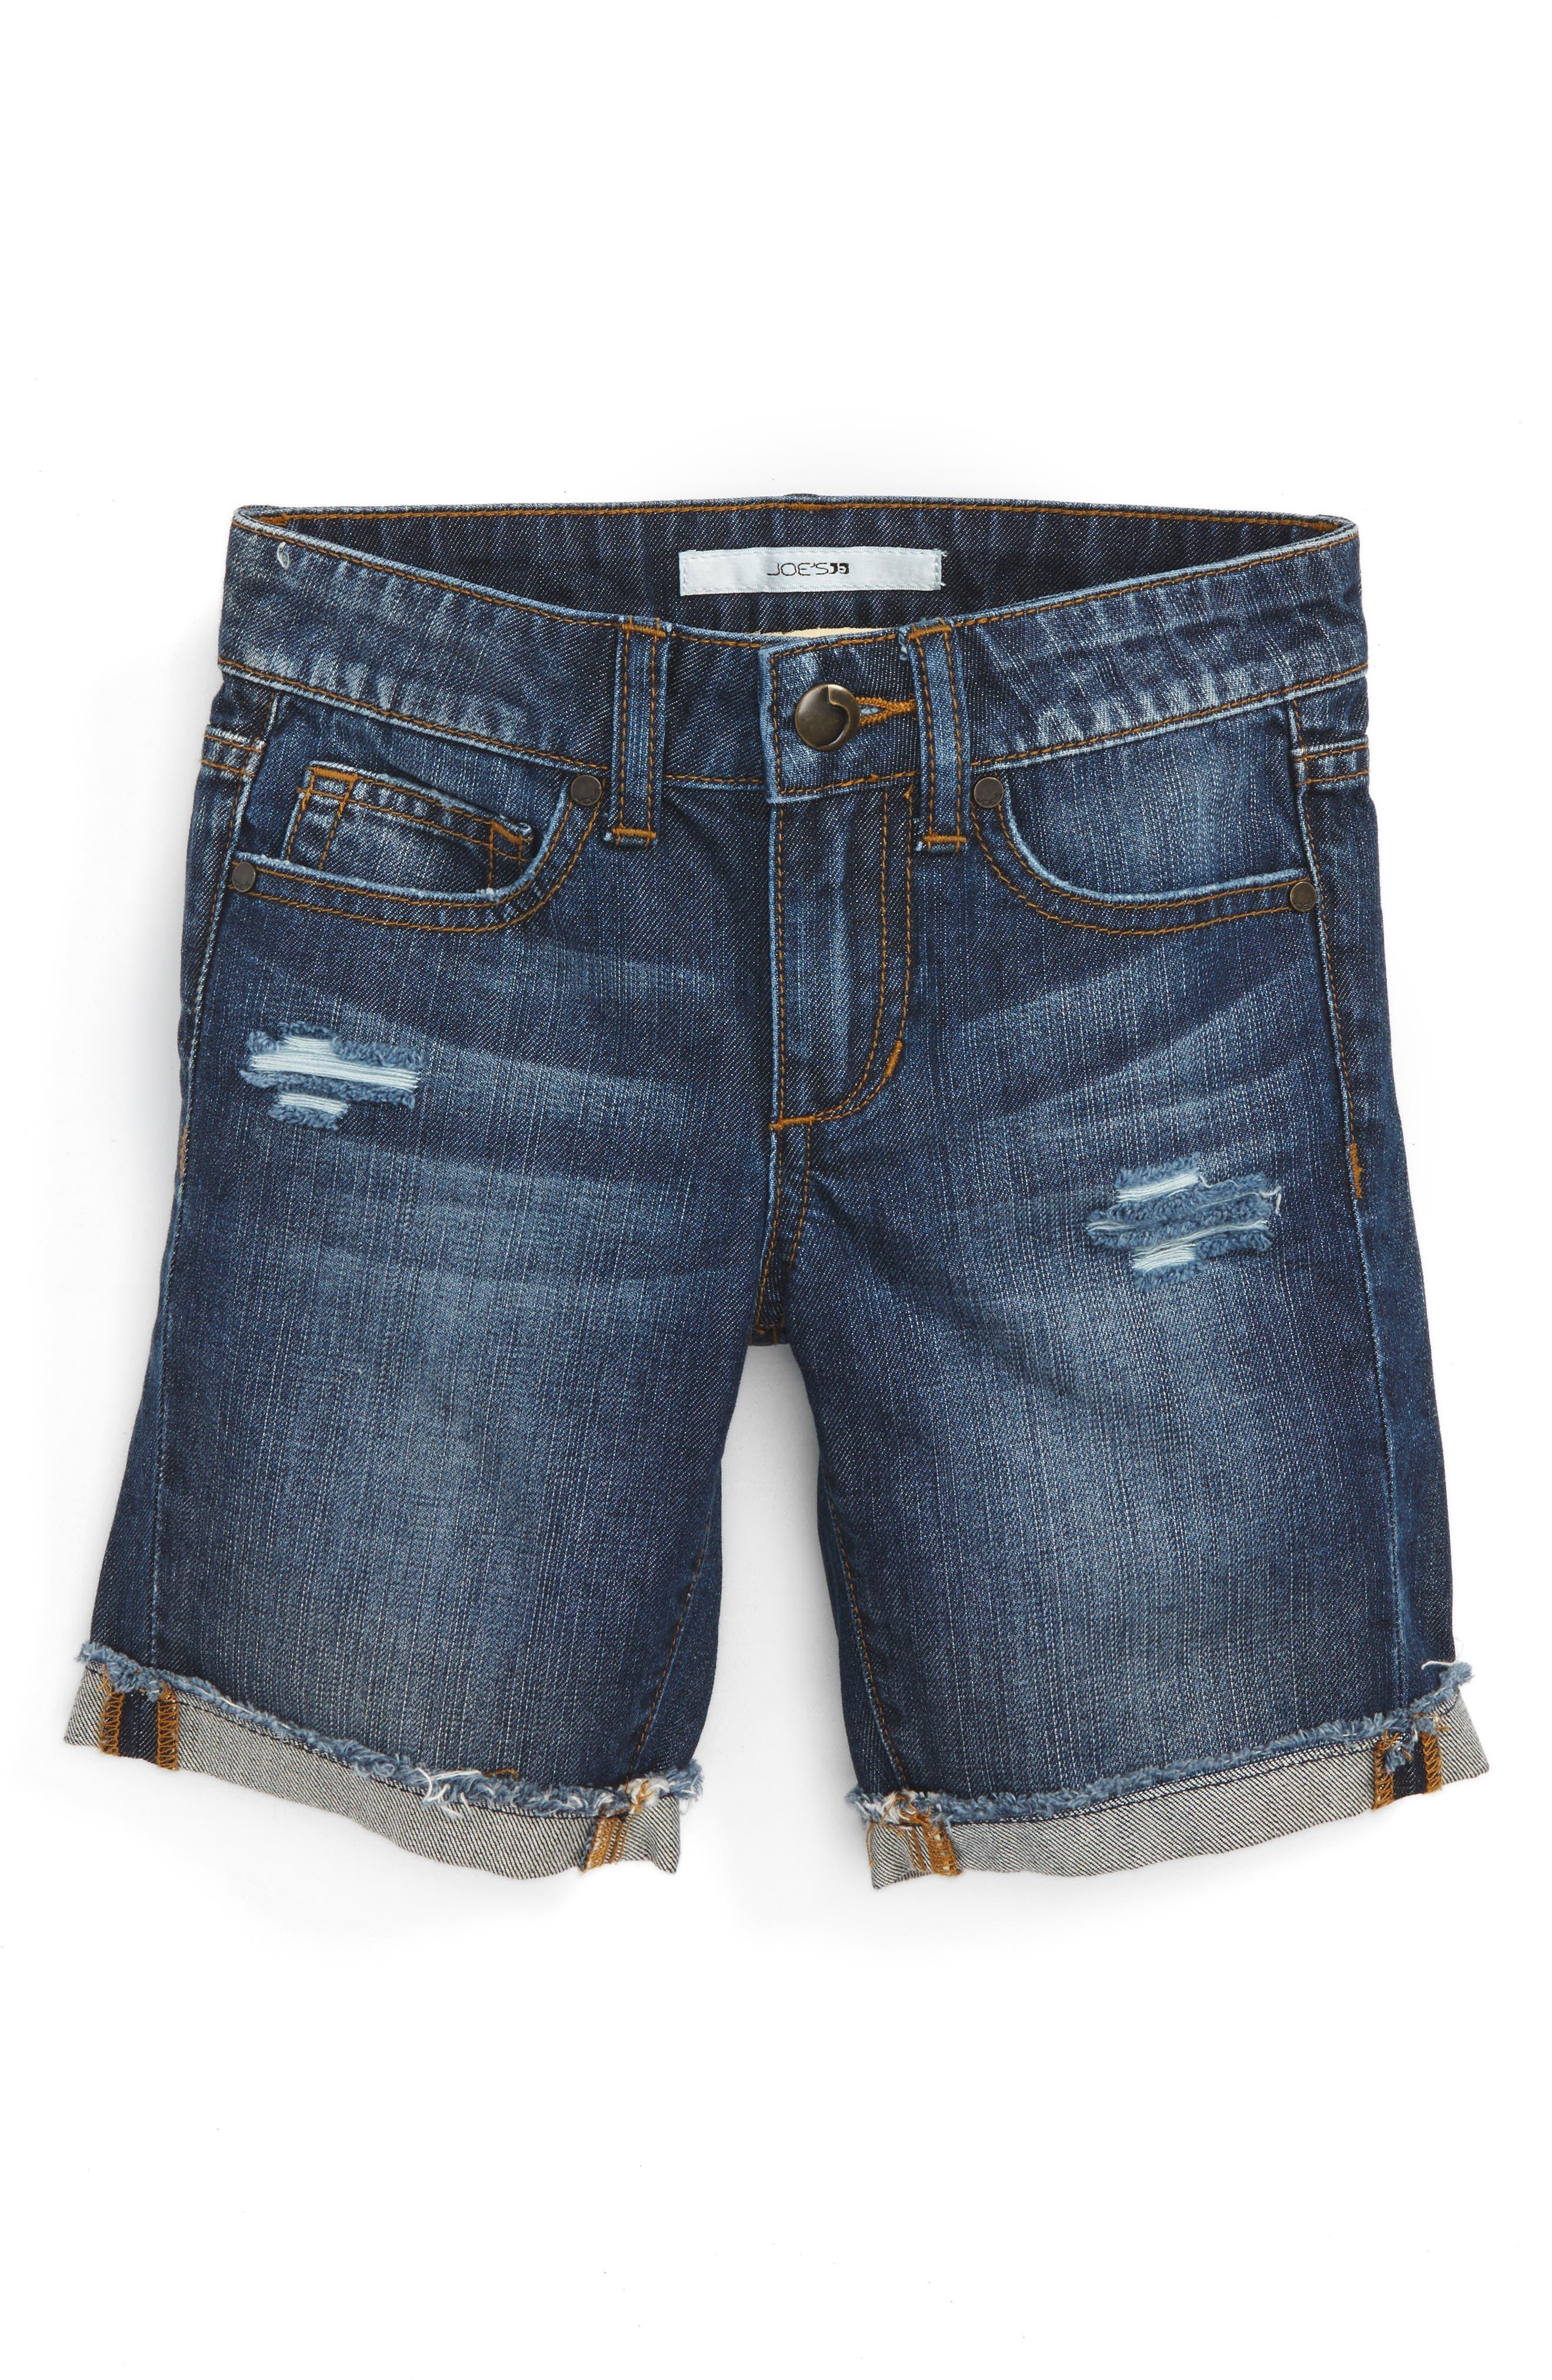 Alternate Image 1 Selected - Joe's Frayed Cuff Bermuda Shorts (Toddler Girls & Little Girls)